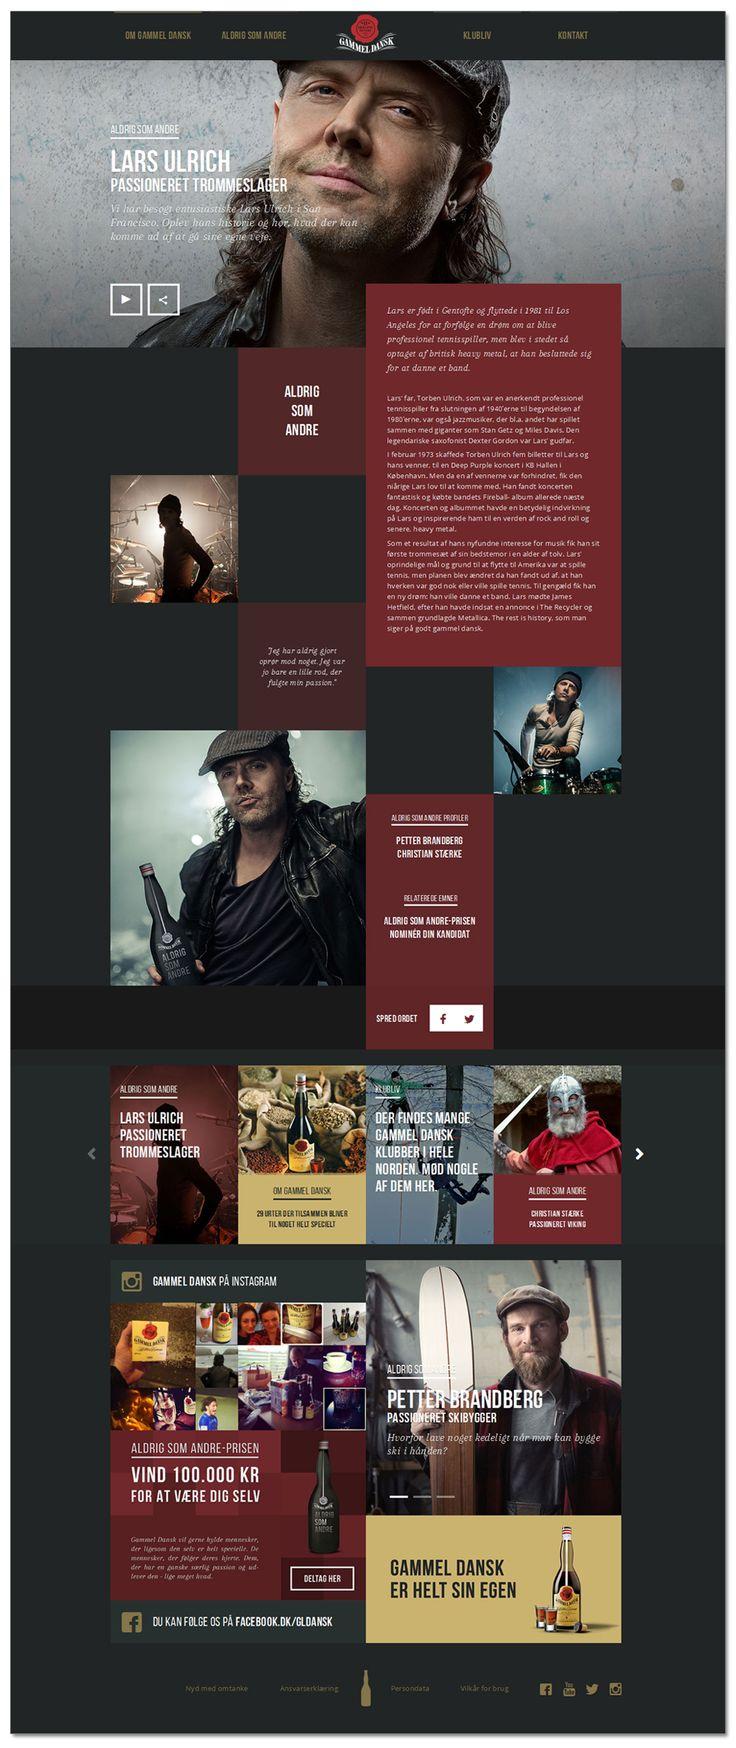 Daily Web Design and Development Inspirations No.301